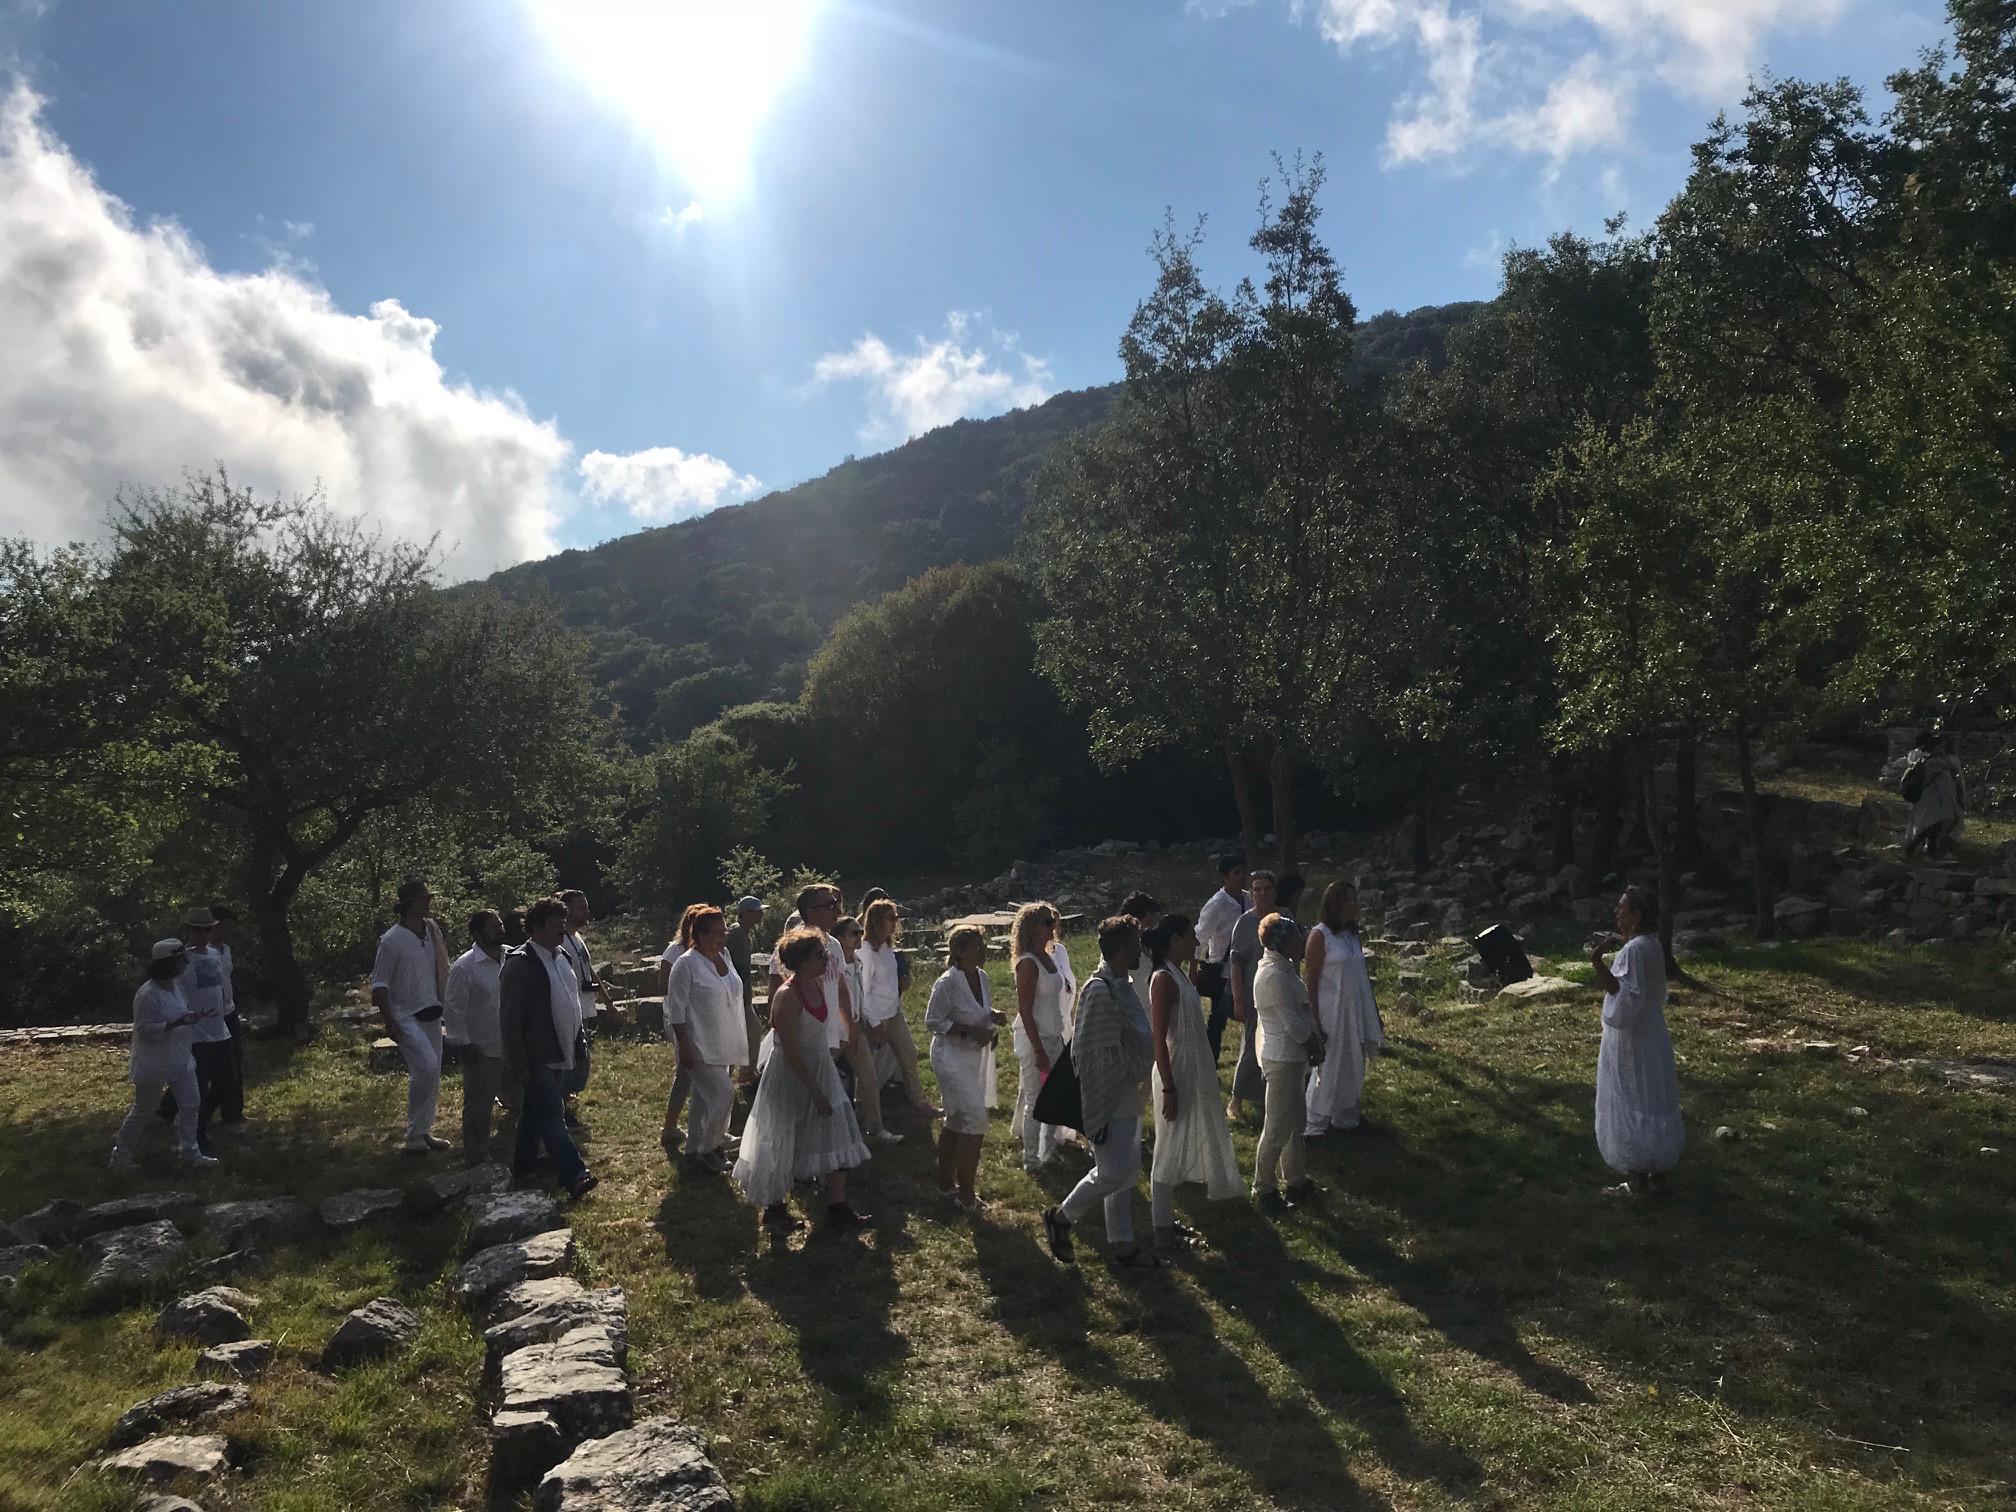 Apollonas perfomers